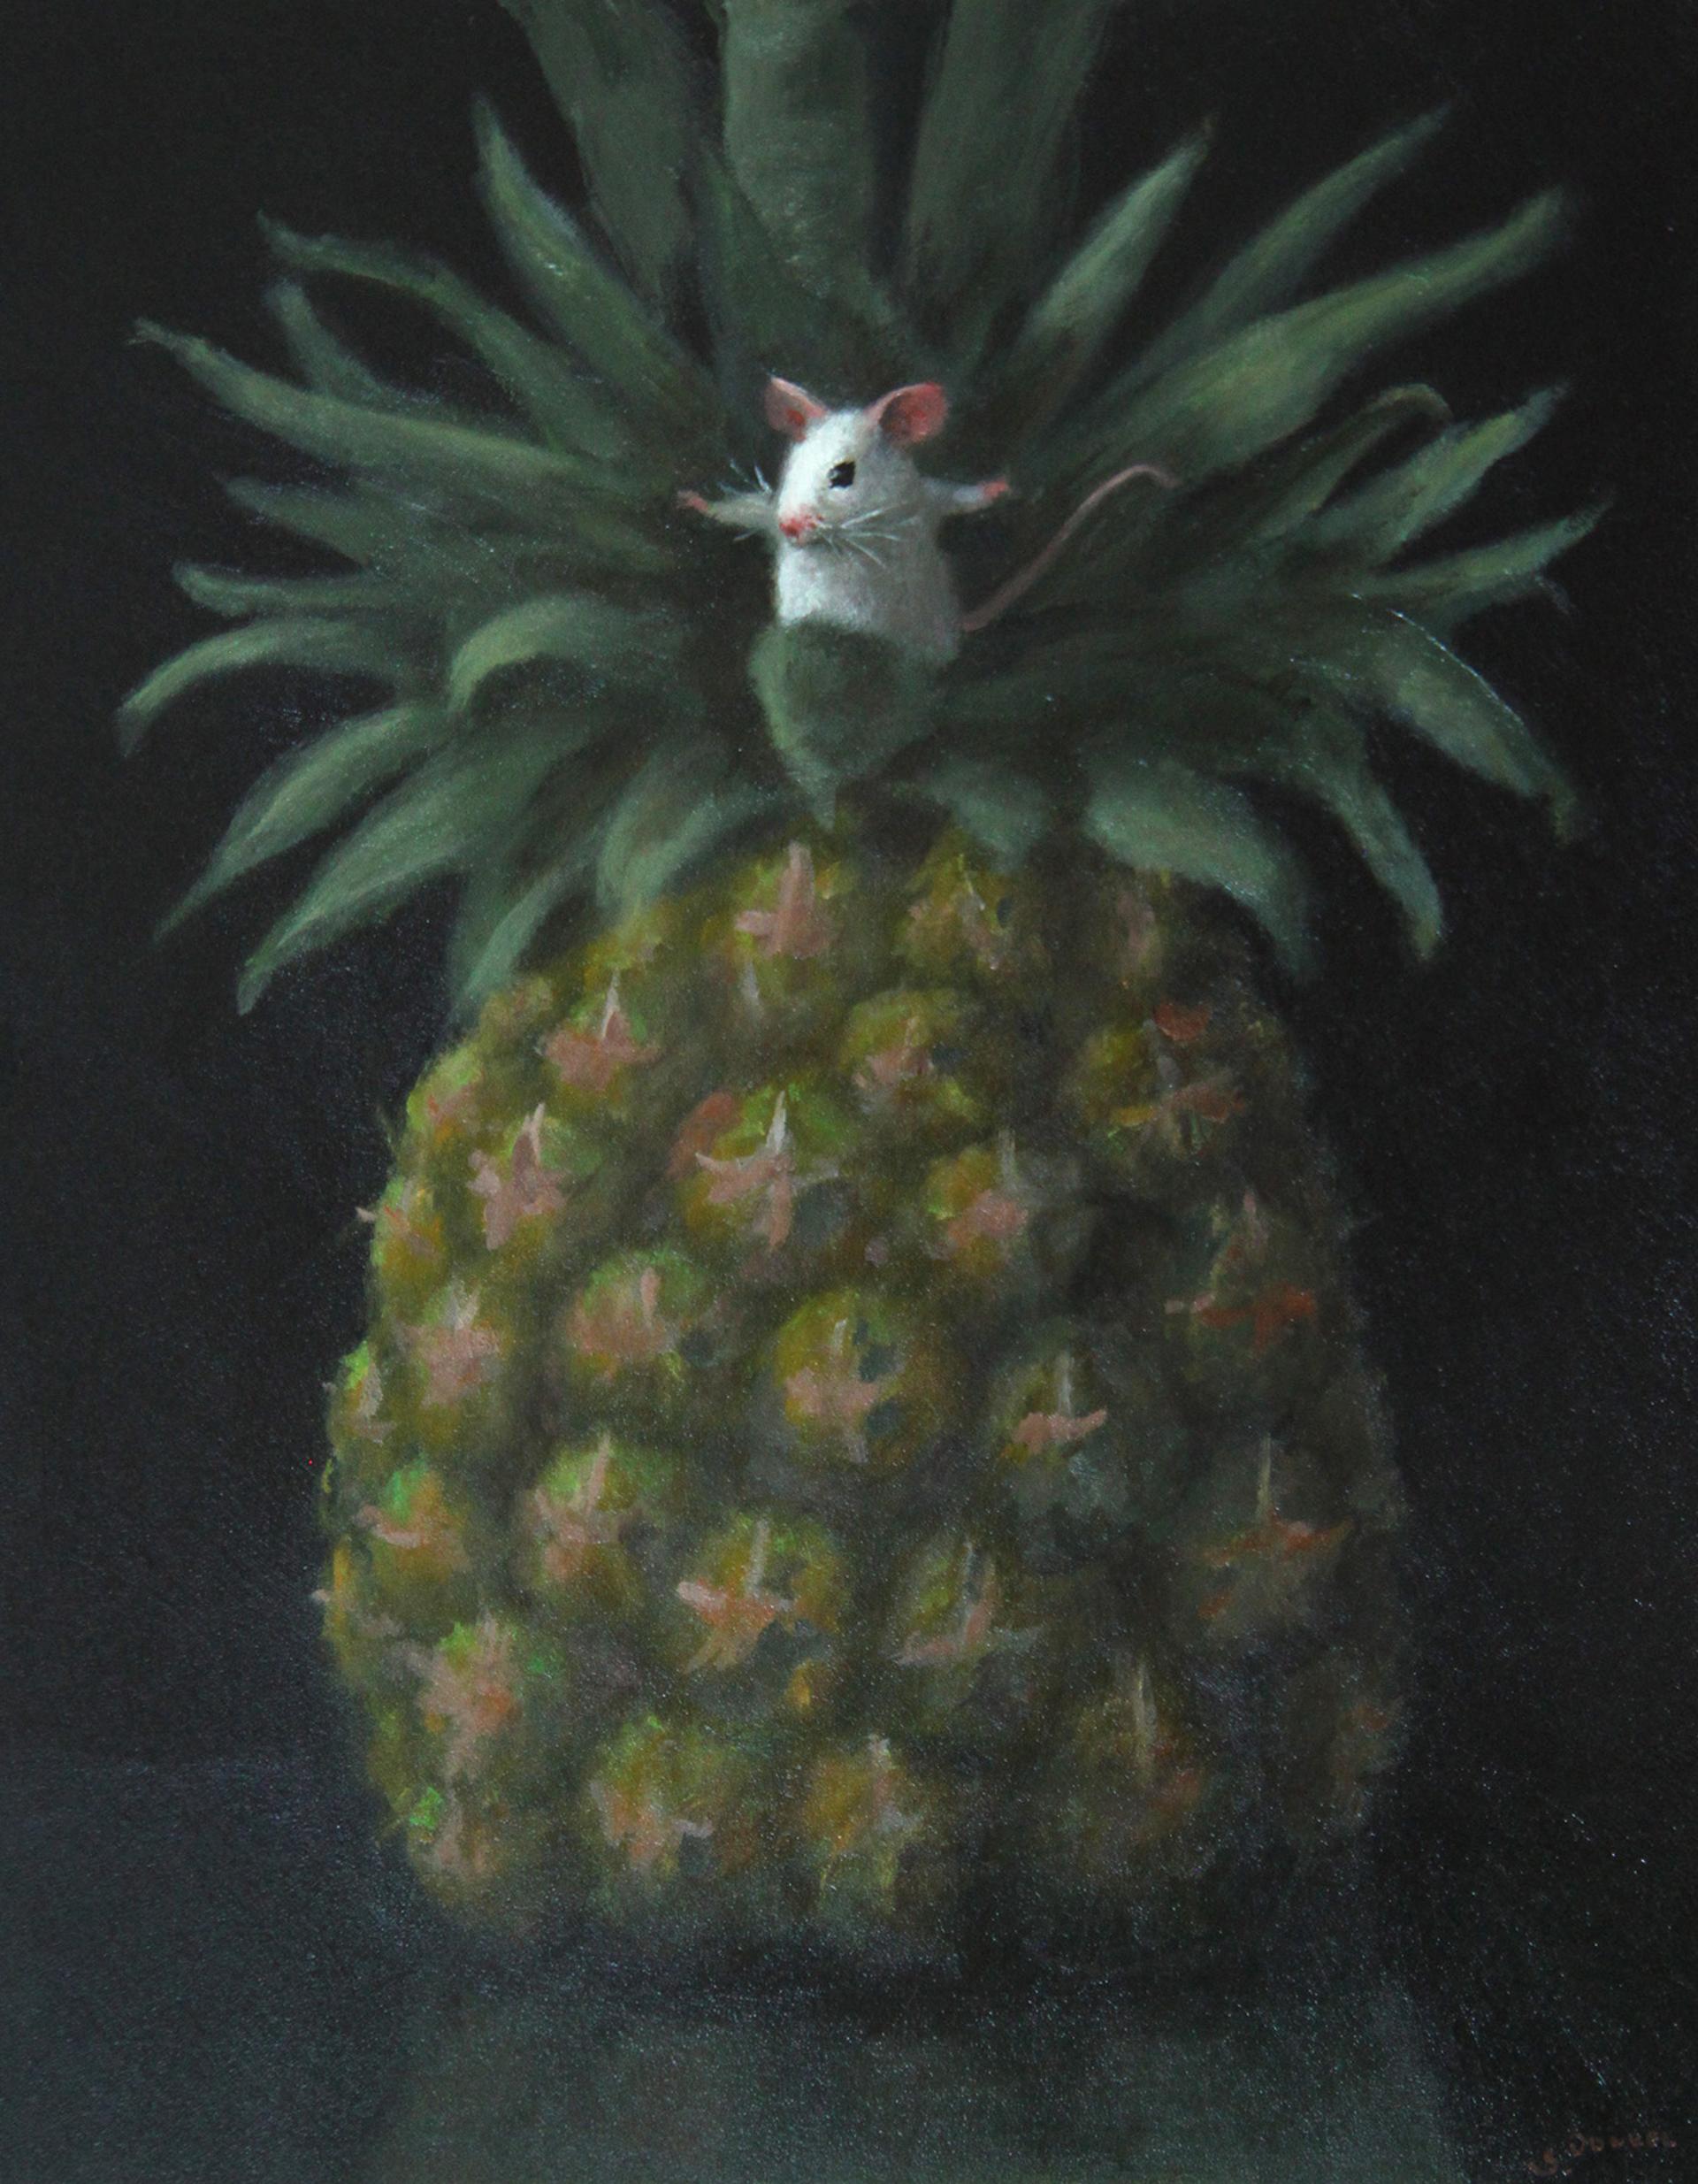 Pineapple Perch by Stuart Dunkel